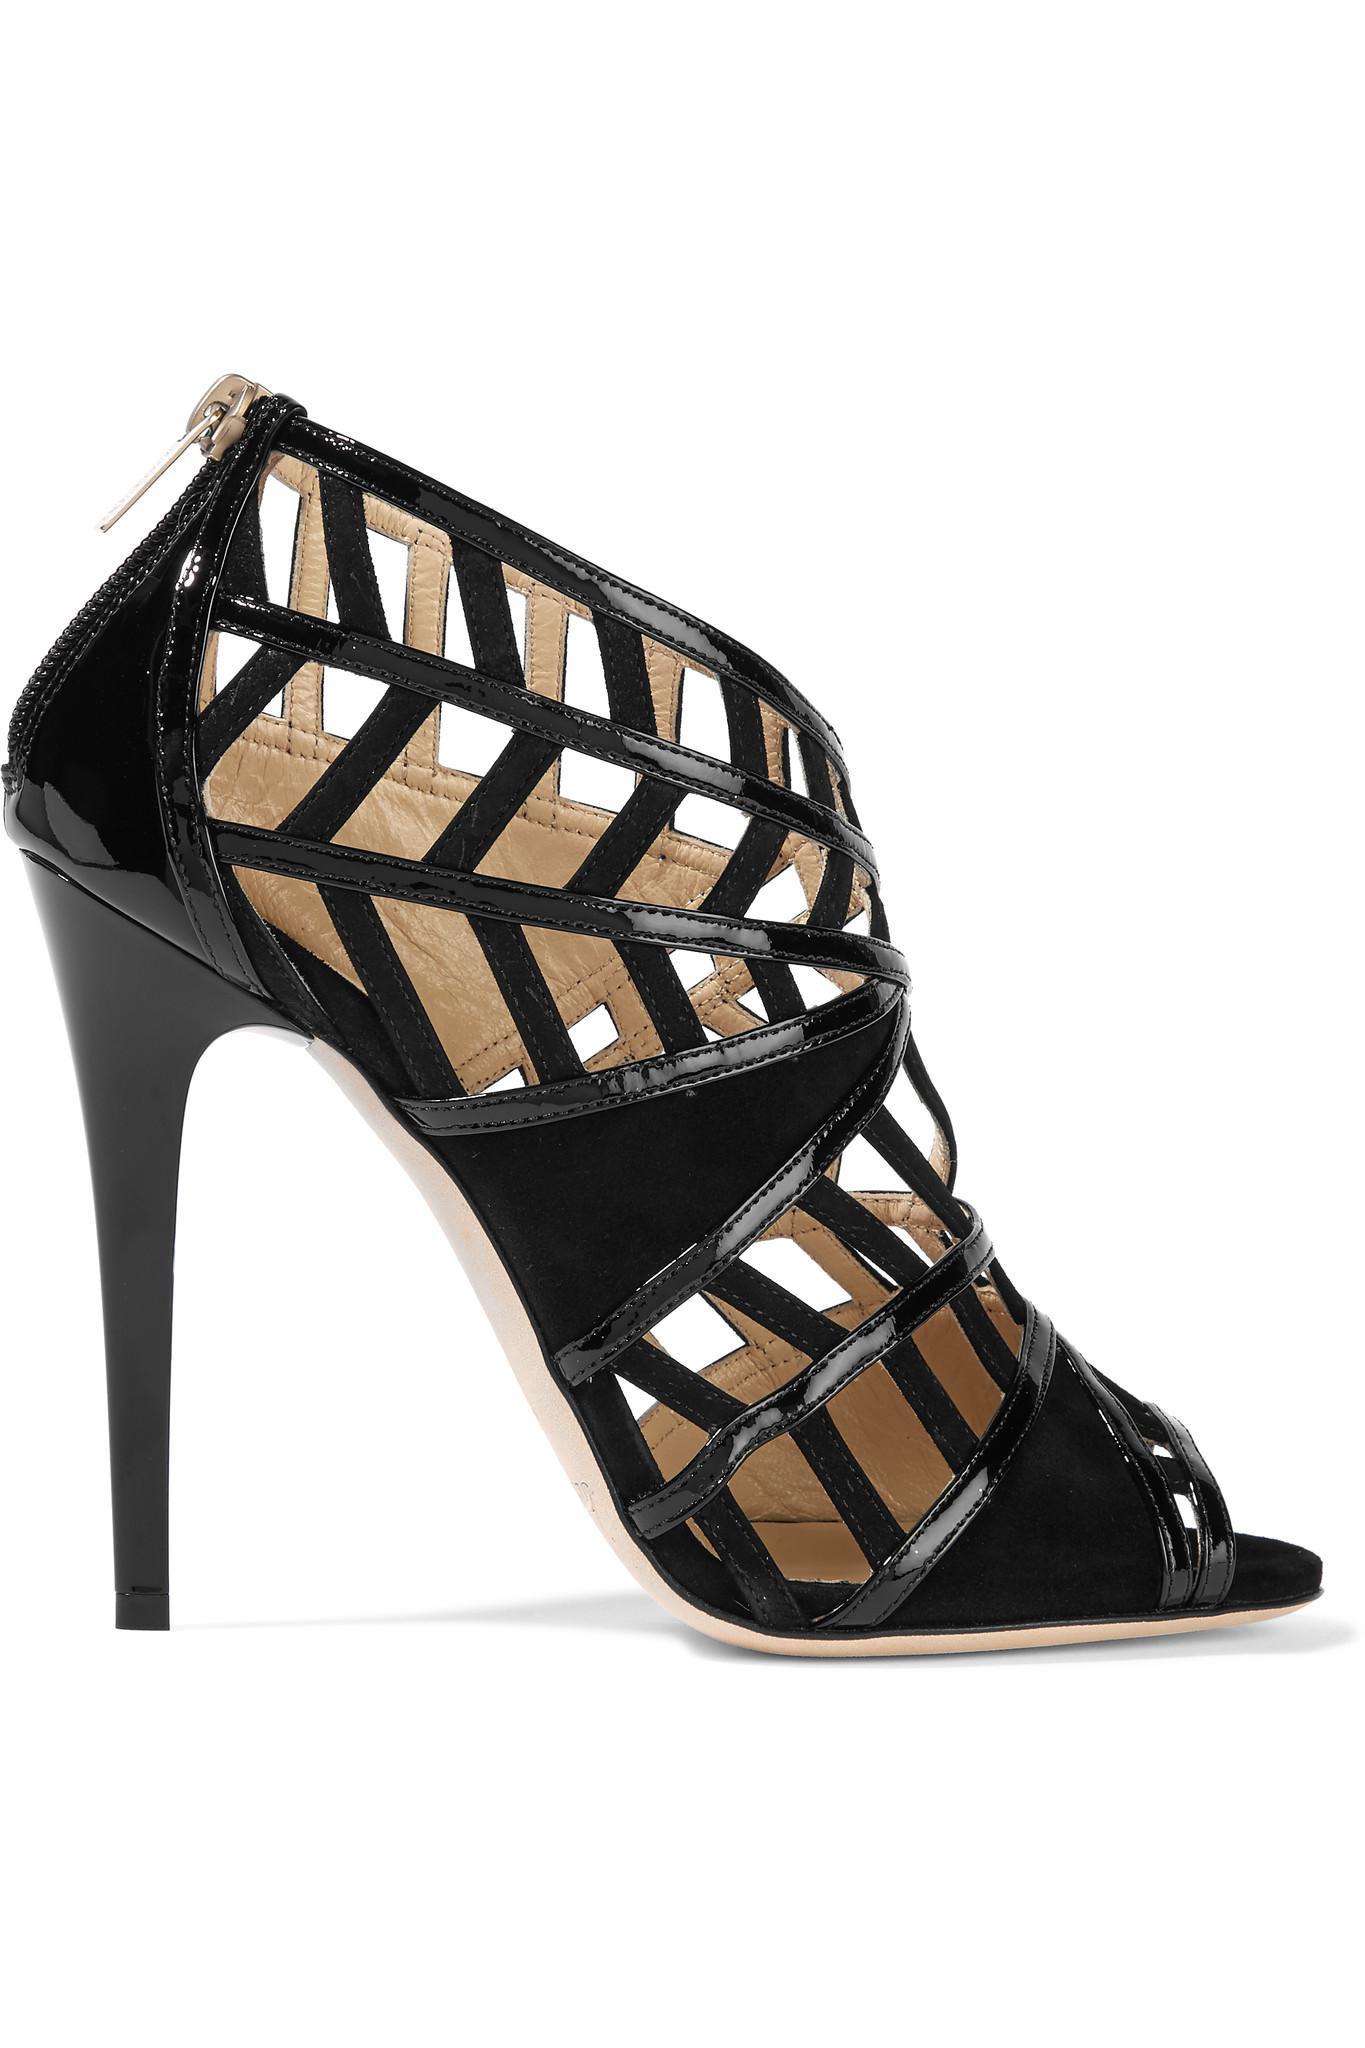 Jimmy Choo Patent Leather Cut-Out Sandals footlocker finishline g76TpuqFK